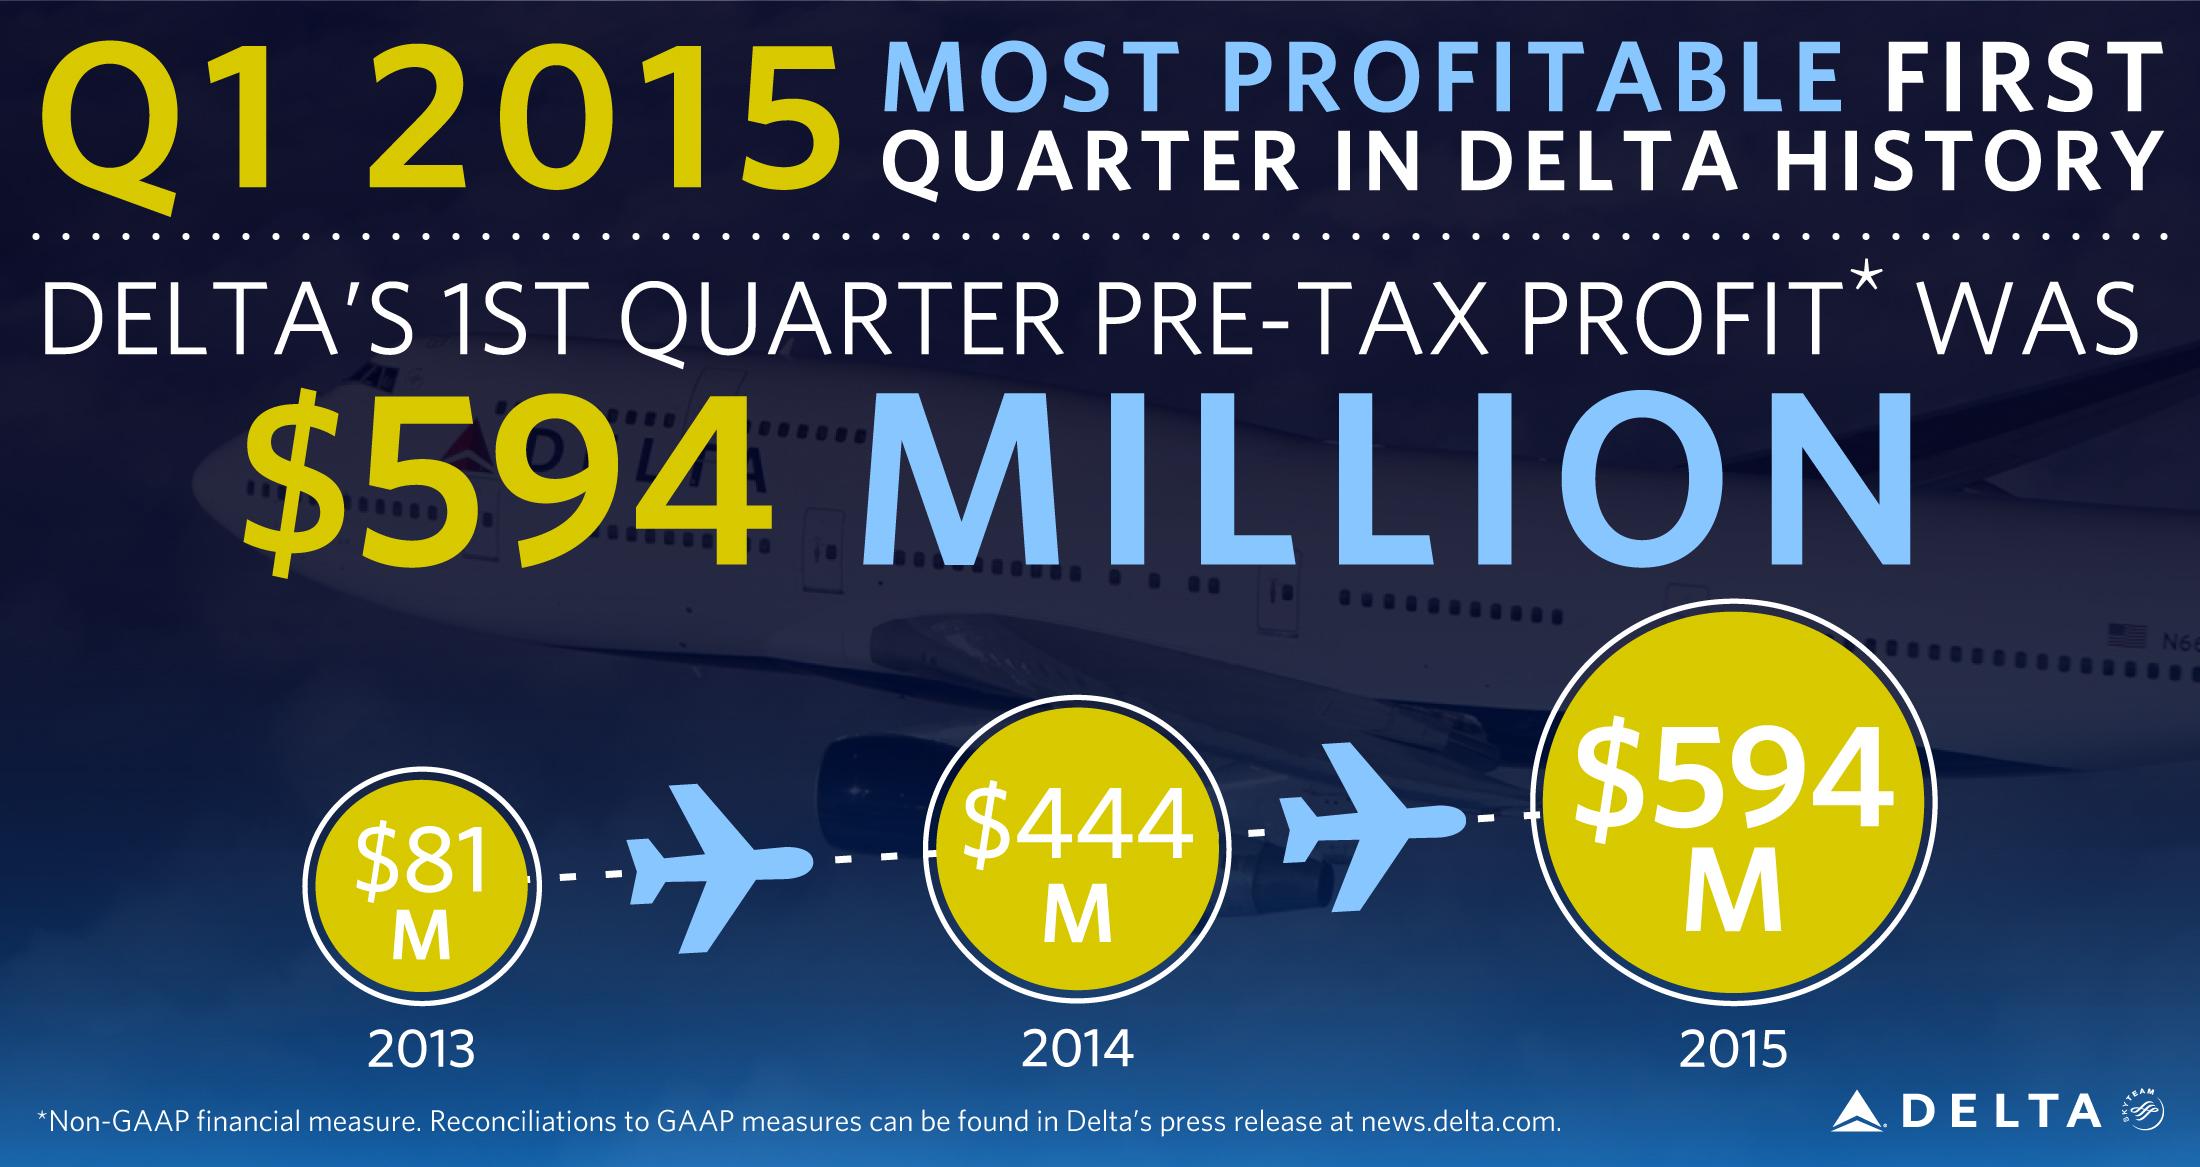 2015 Most Profitable 1st Quarter graphic